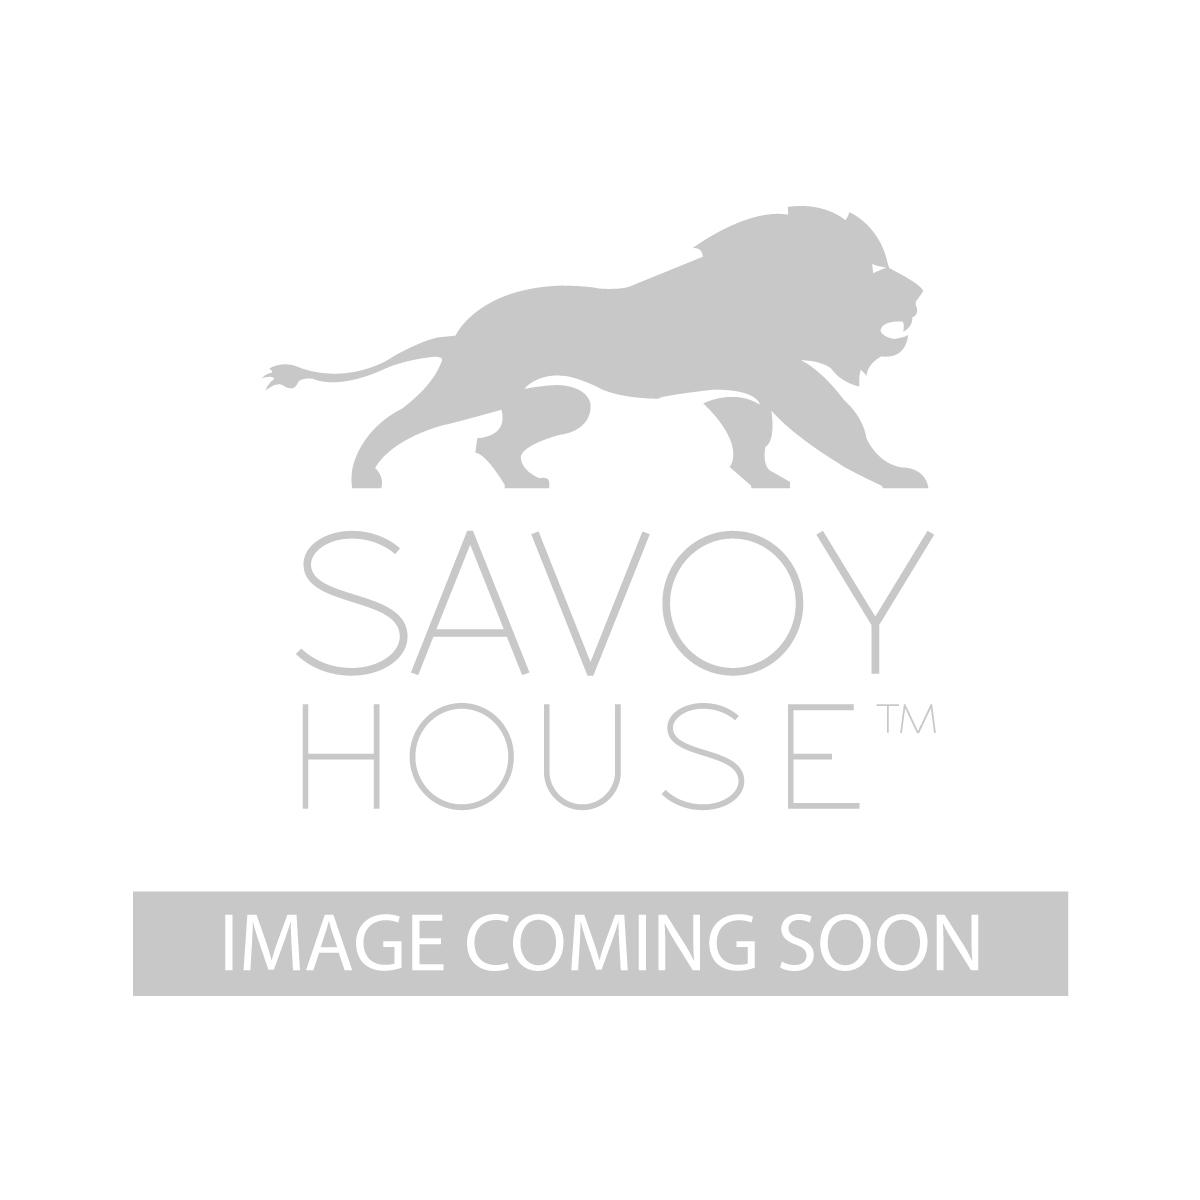 52 ecm 5rv sn first value ceiling fan by savoy house first value ceiling fan aloadofball Gallery